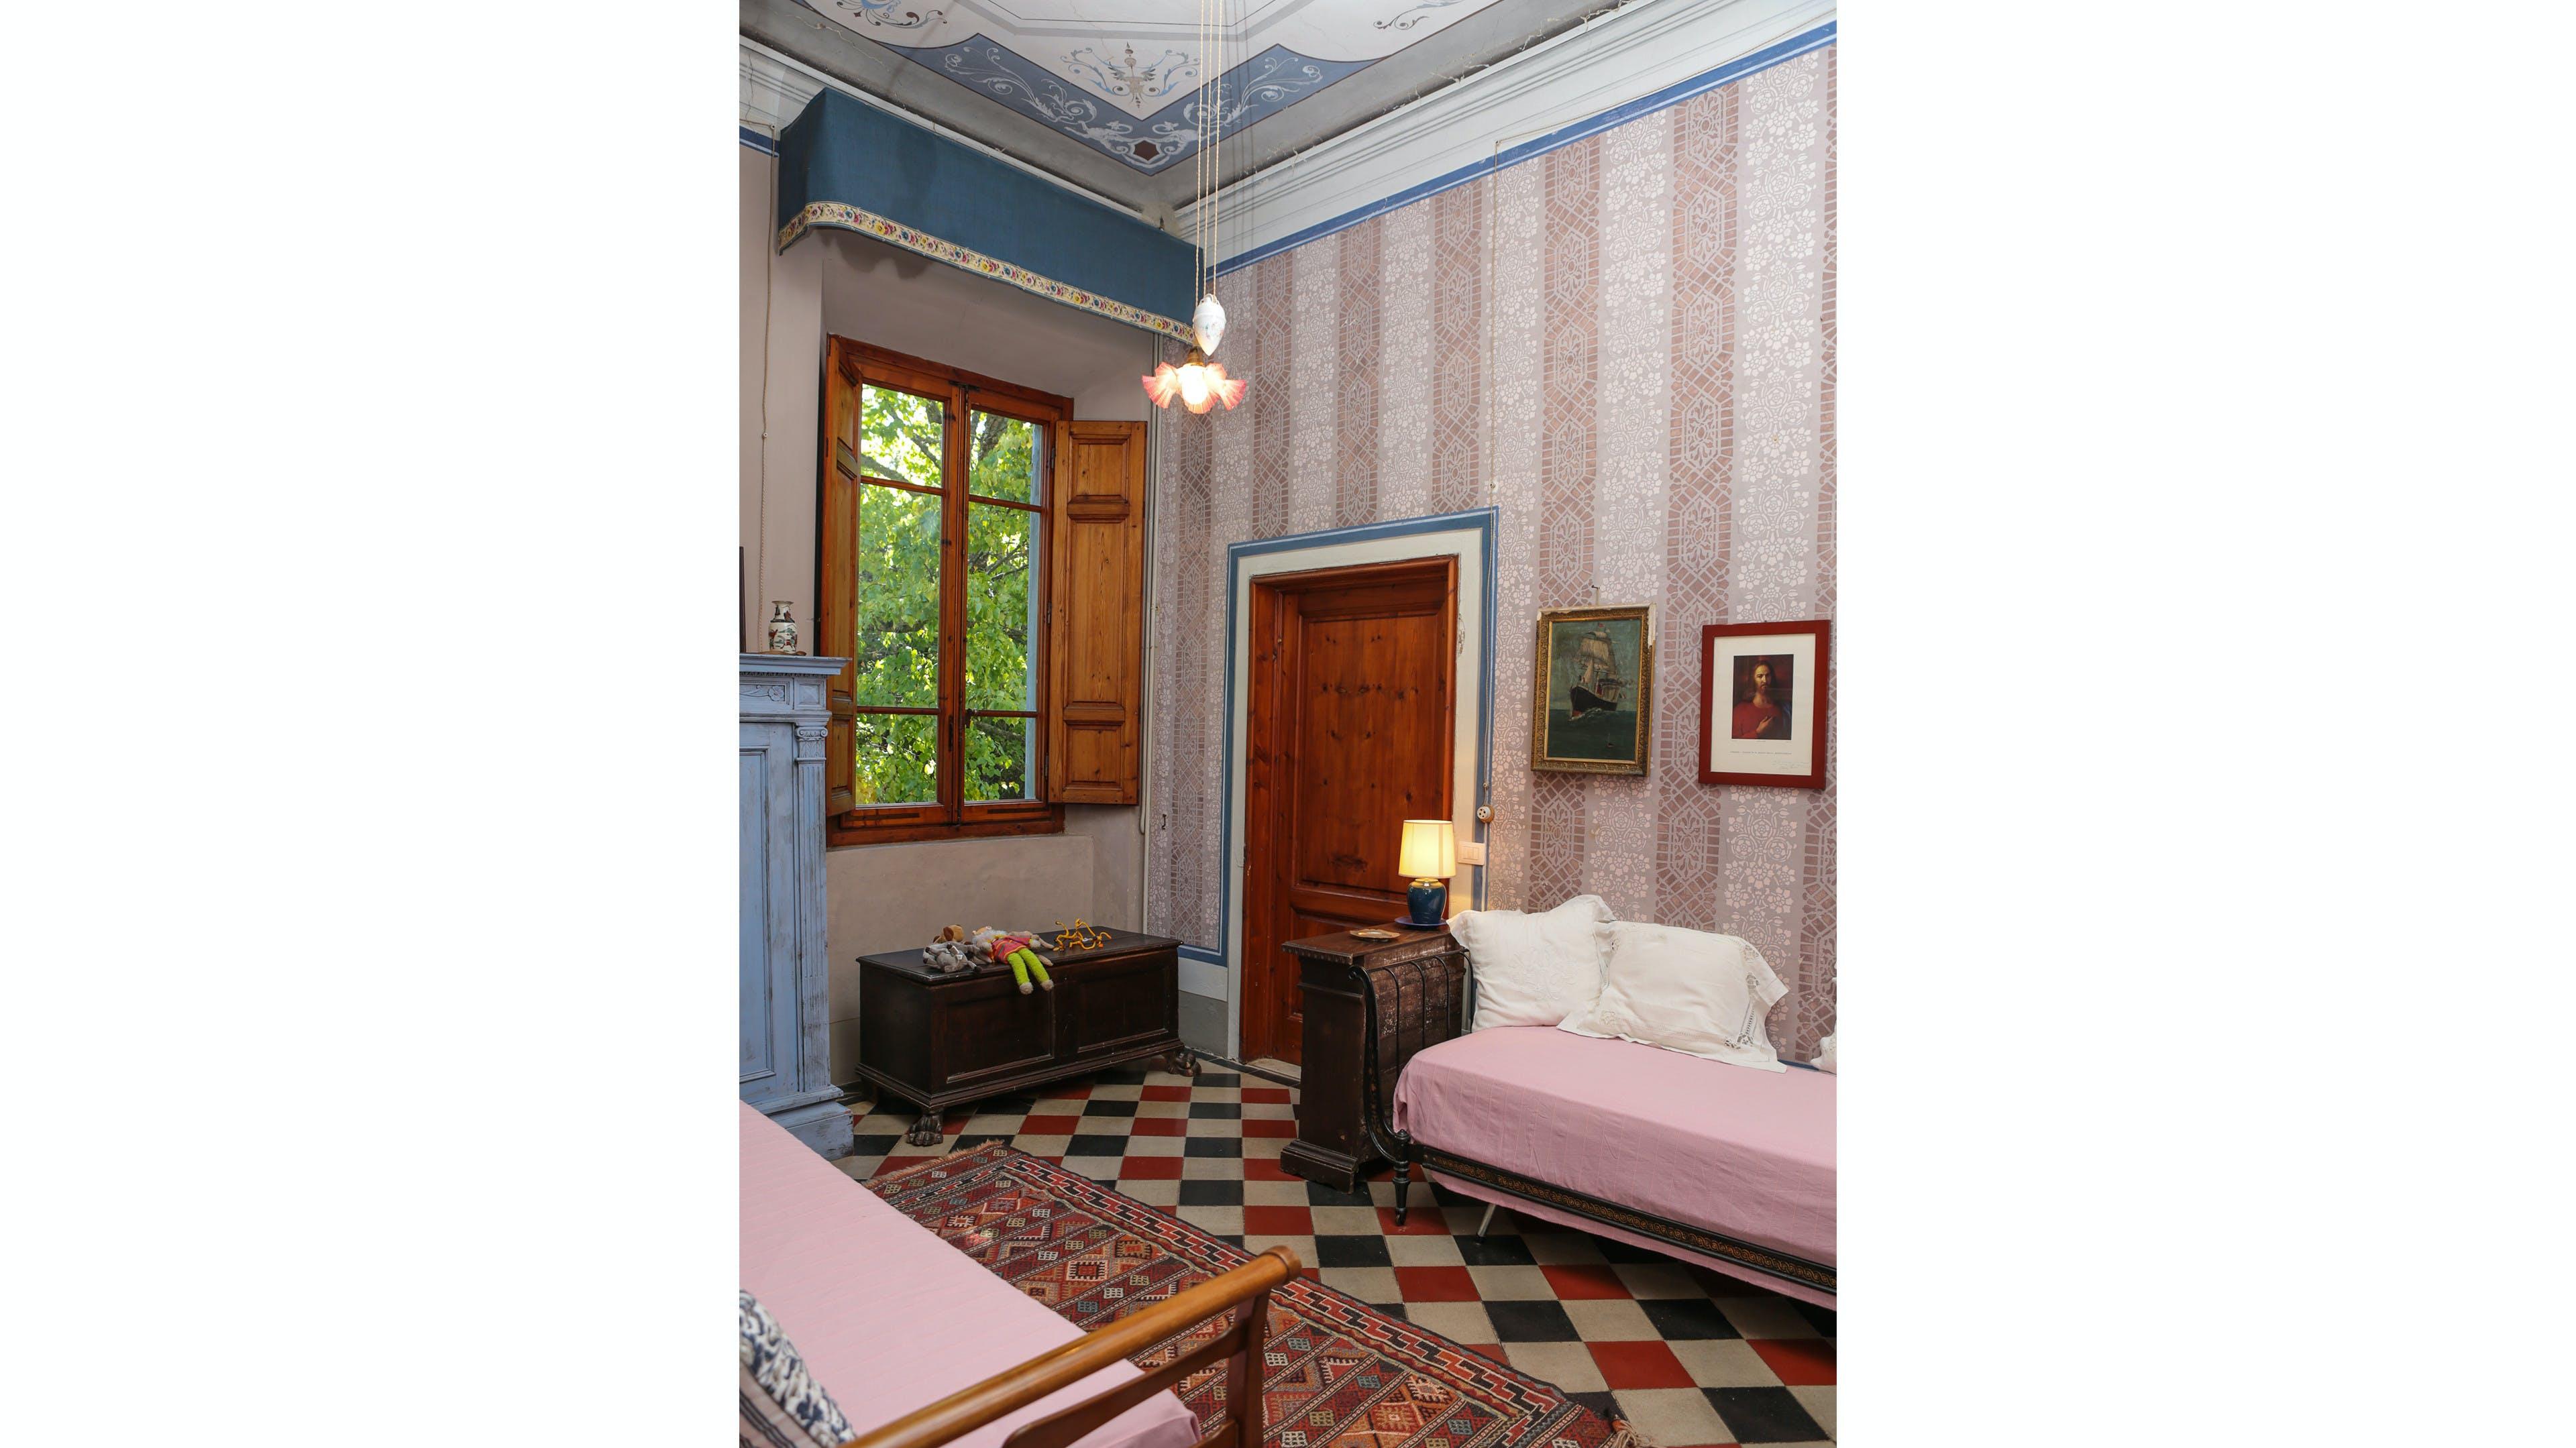 Villa Chianti, Italy -  - New York City Townhouse Real Estate